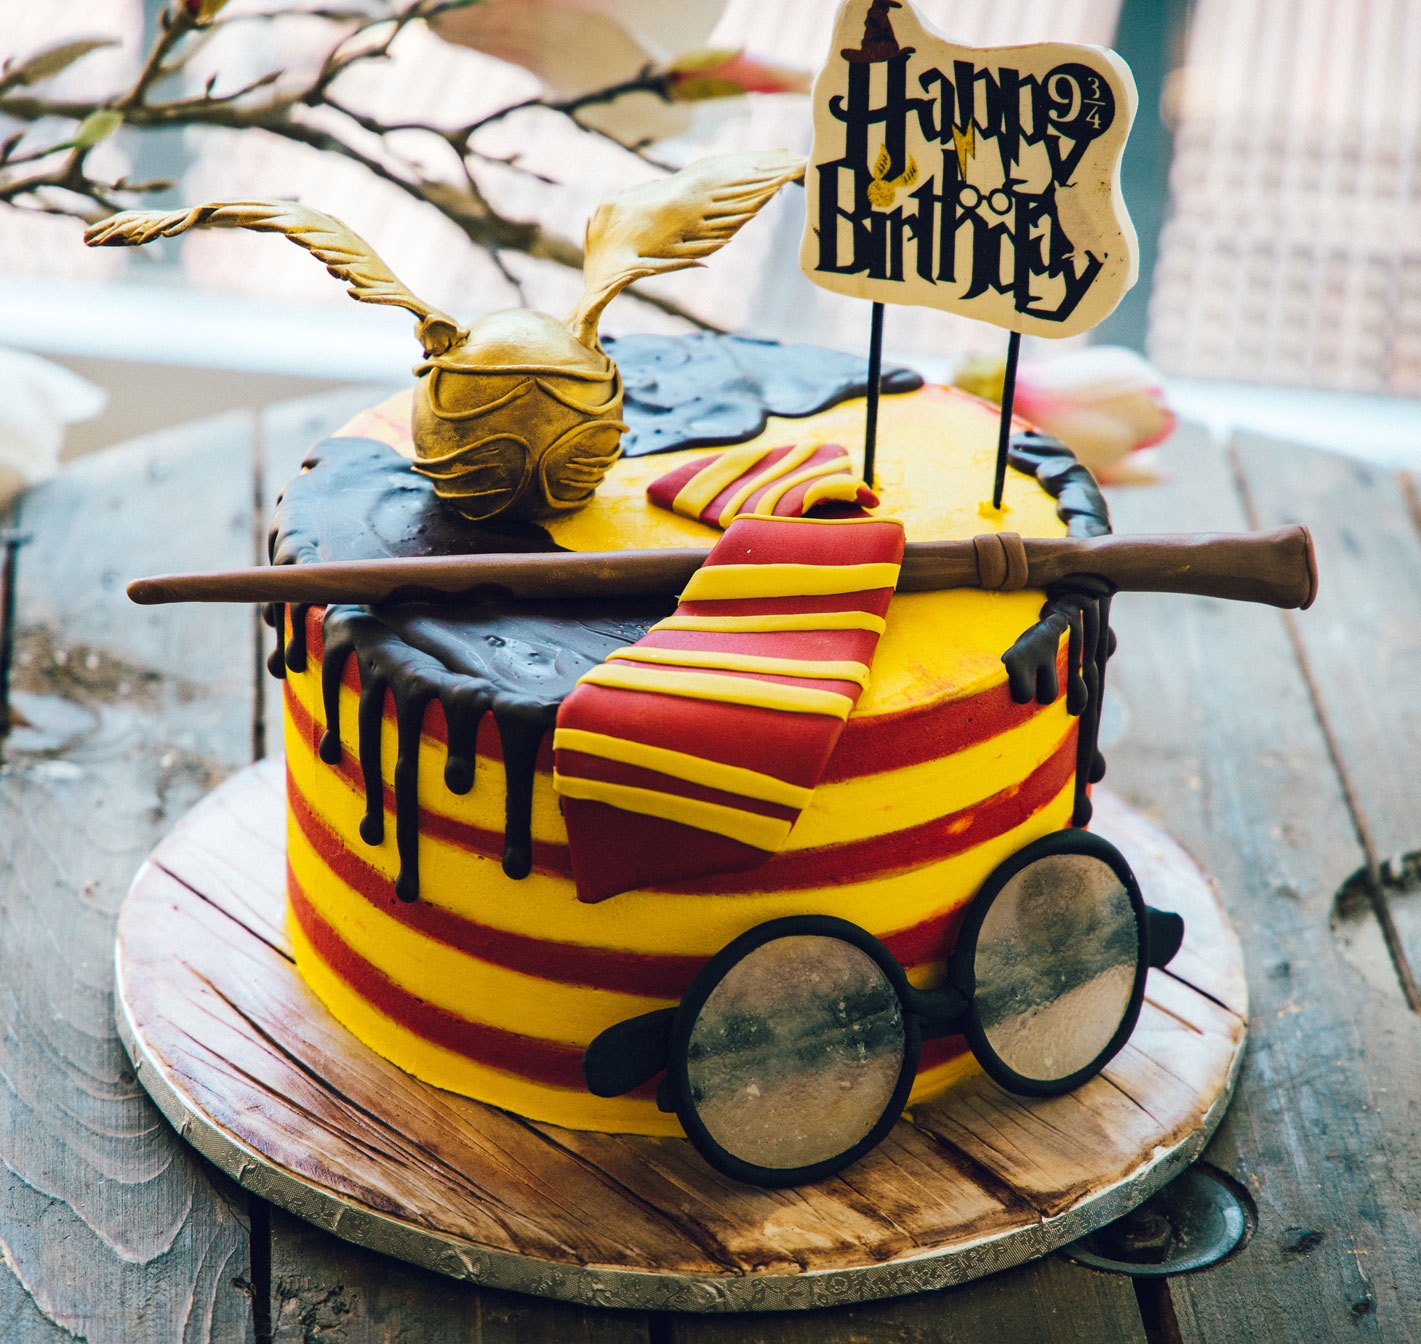 Torta Harry Potter, pasta di zucchero